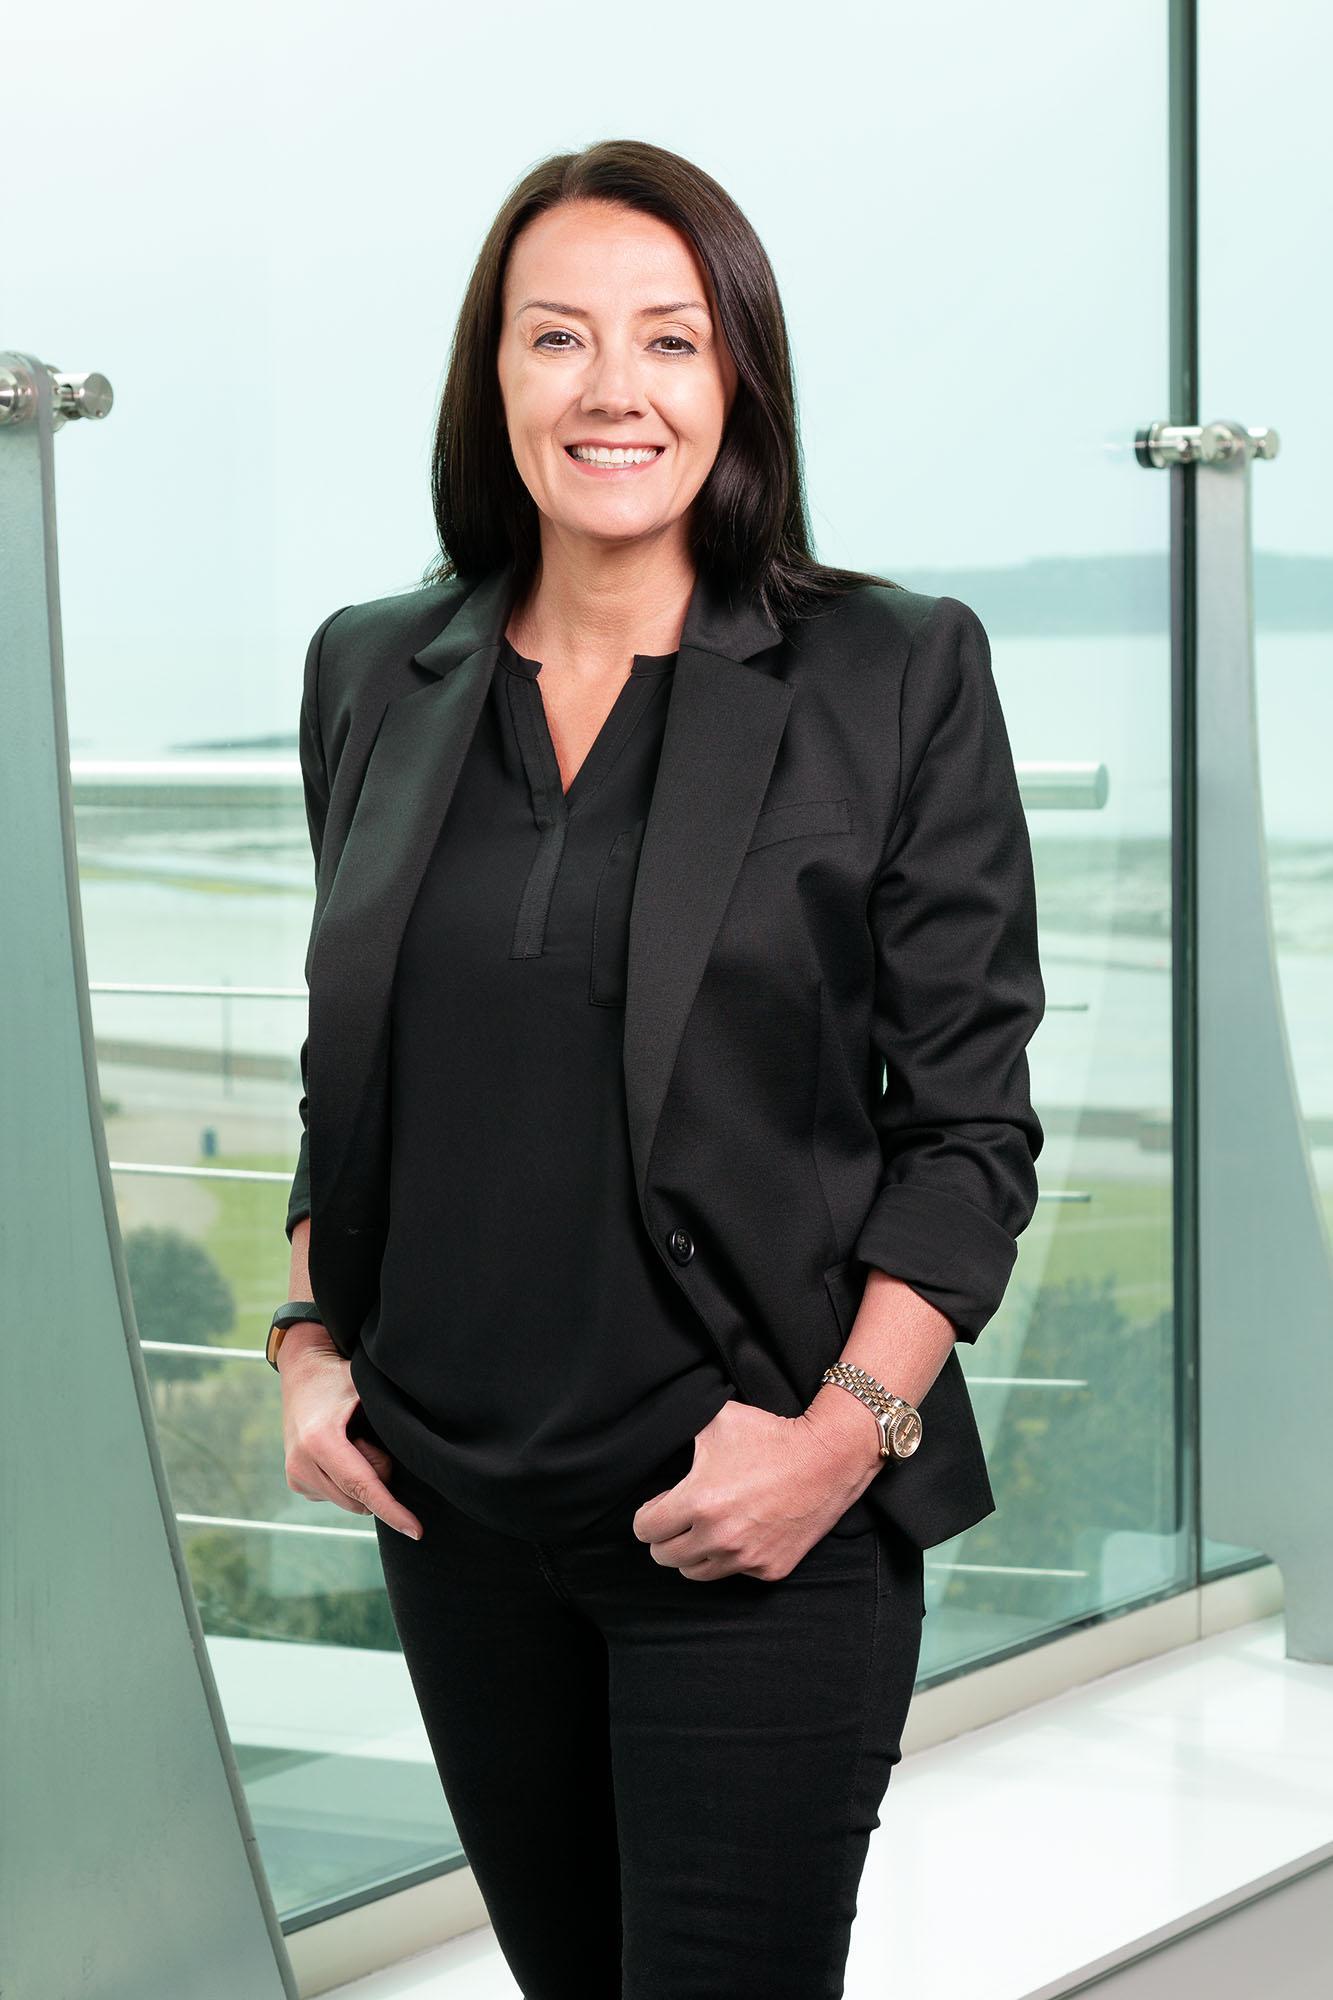 Sue Fox CEO of HSBC Channel Islands